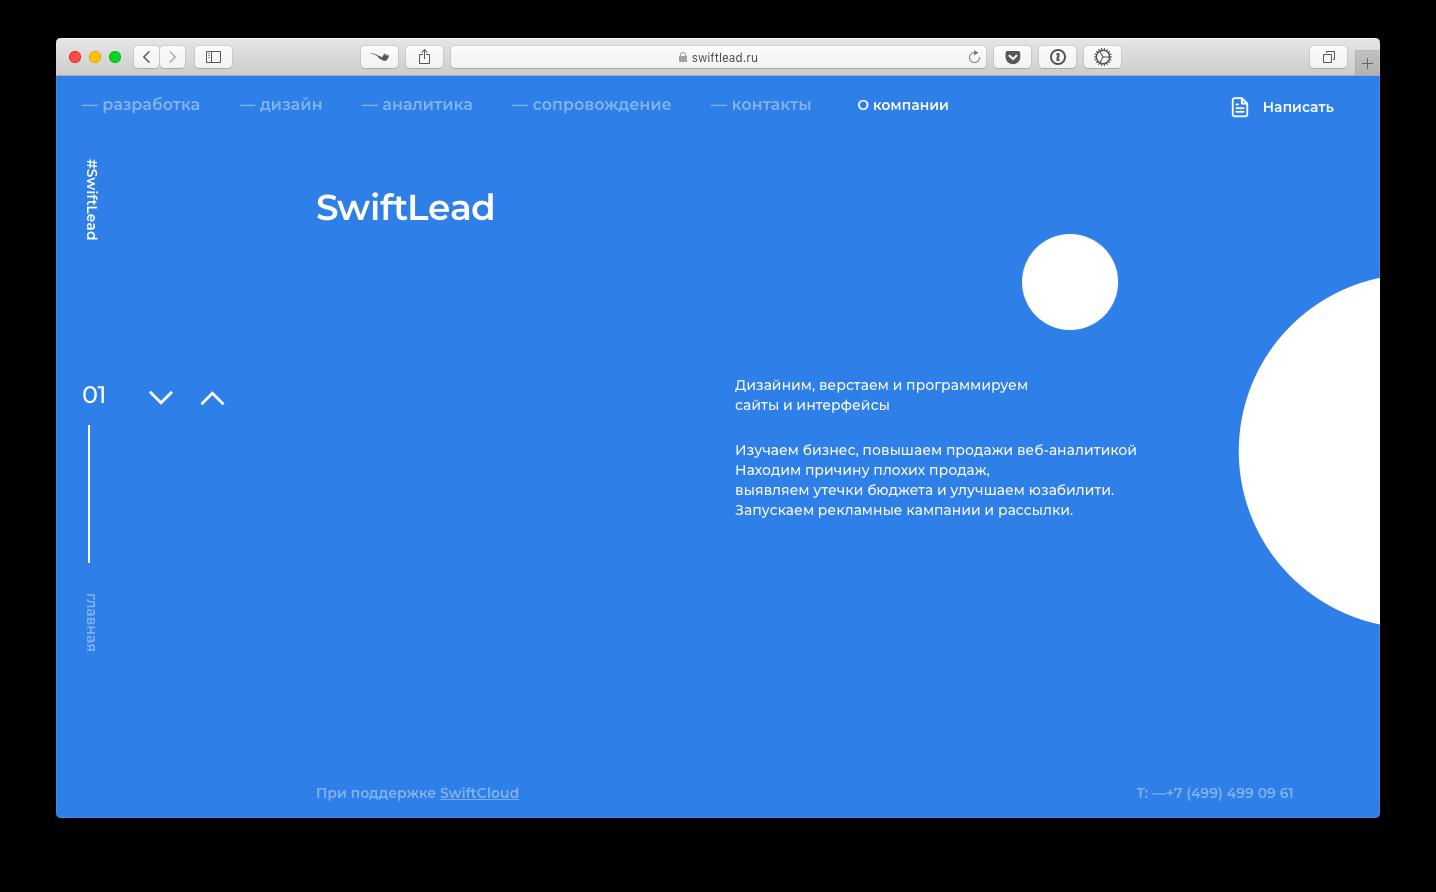 SwiftLead — разрабатываем продающие сайты